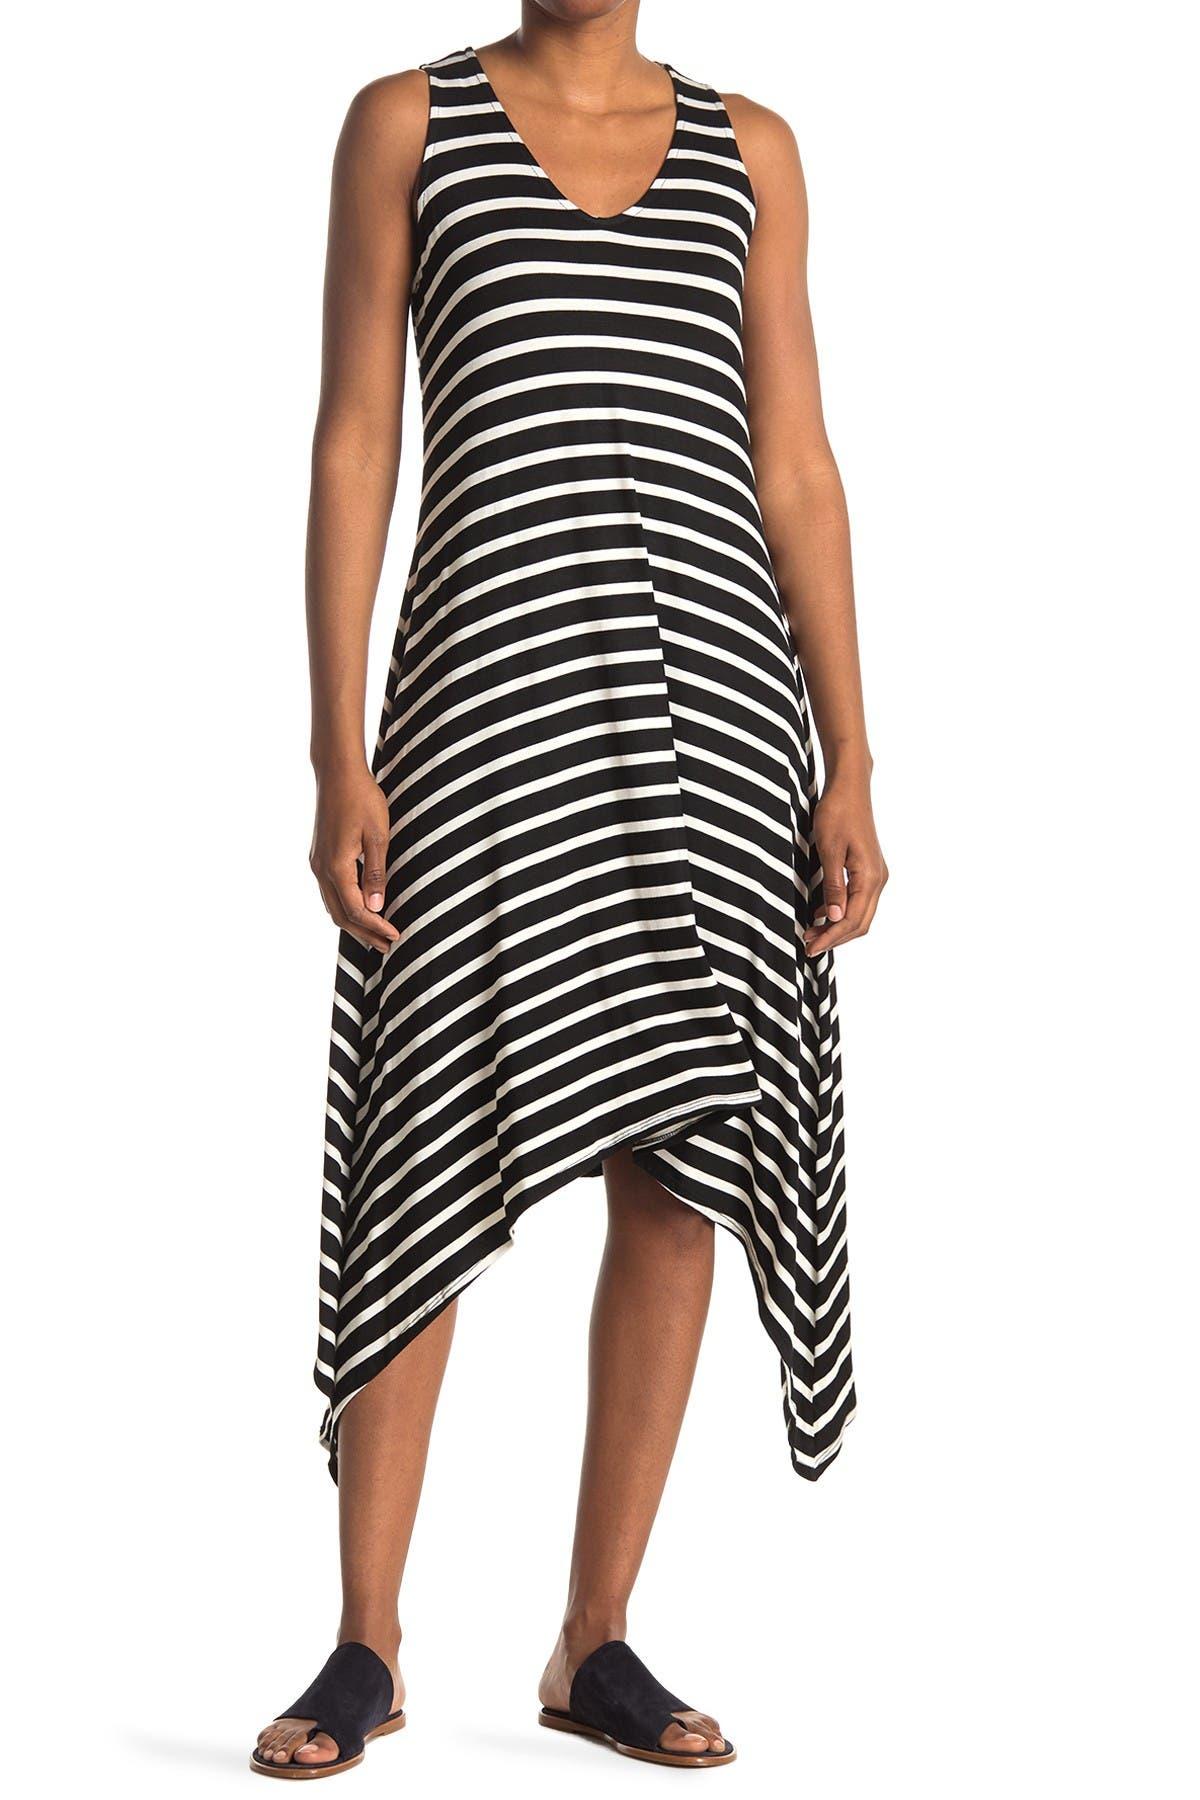 Image of TASH + SOPHIE Striped Sharkbite Midi Dress